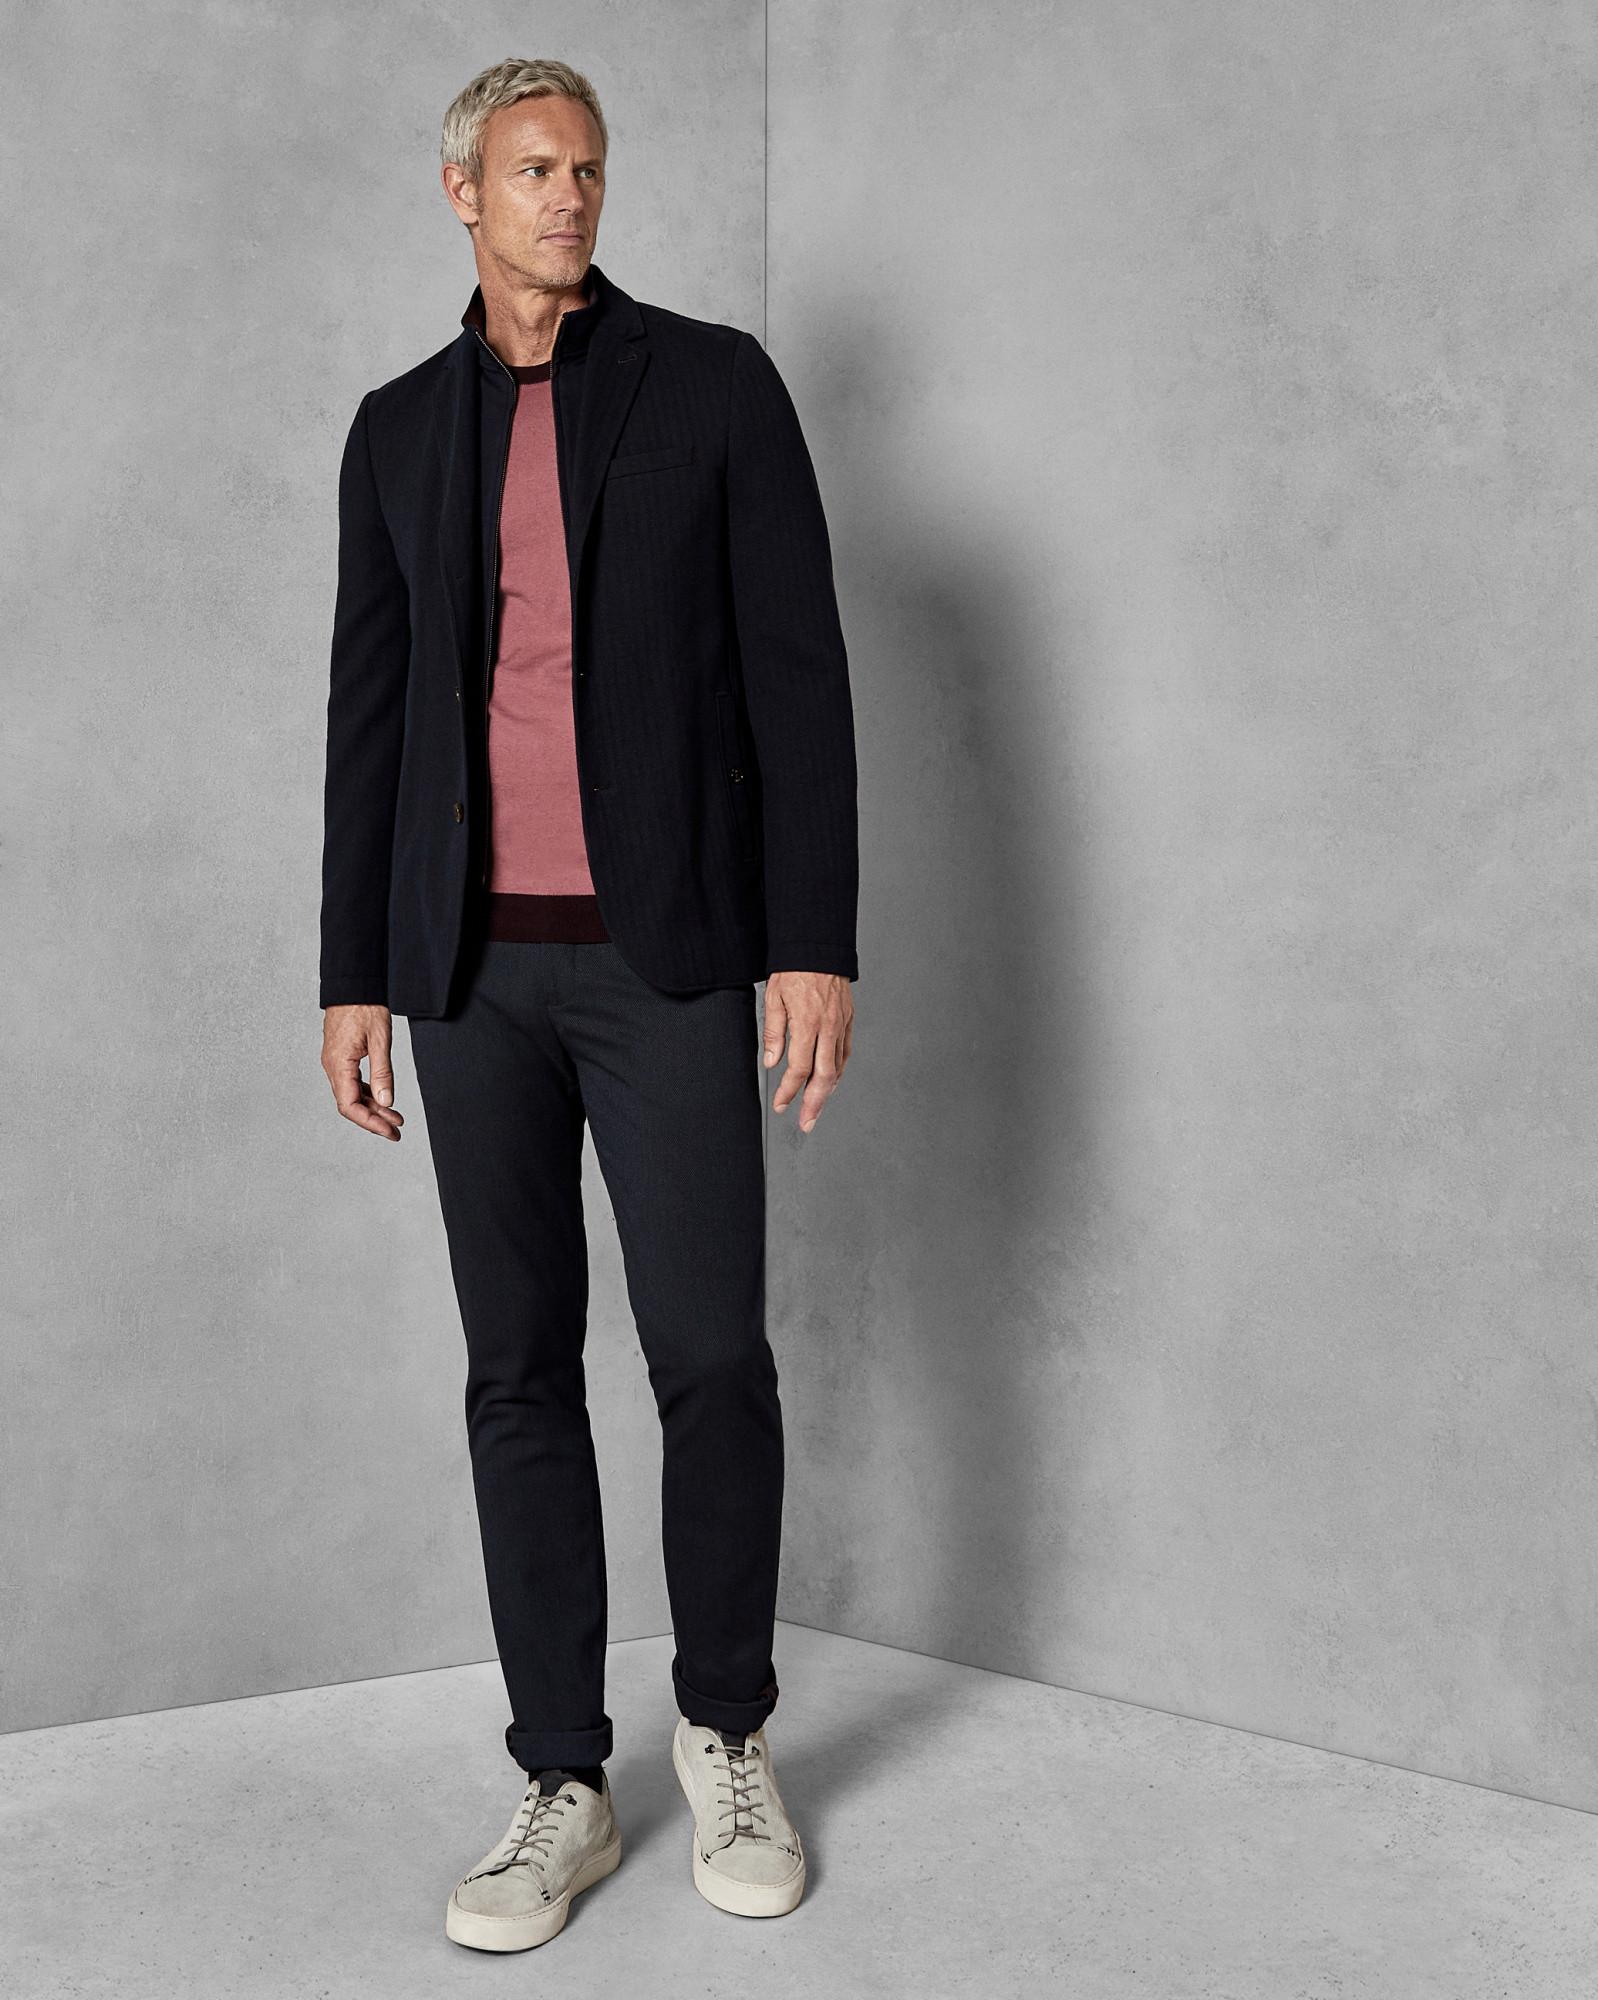 8a6a739fb88cd2 2-in-1 Herringbone Jersey Jacket